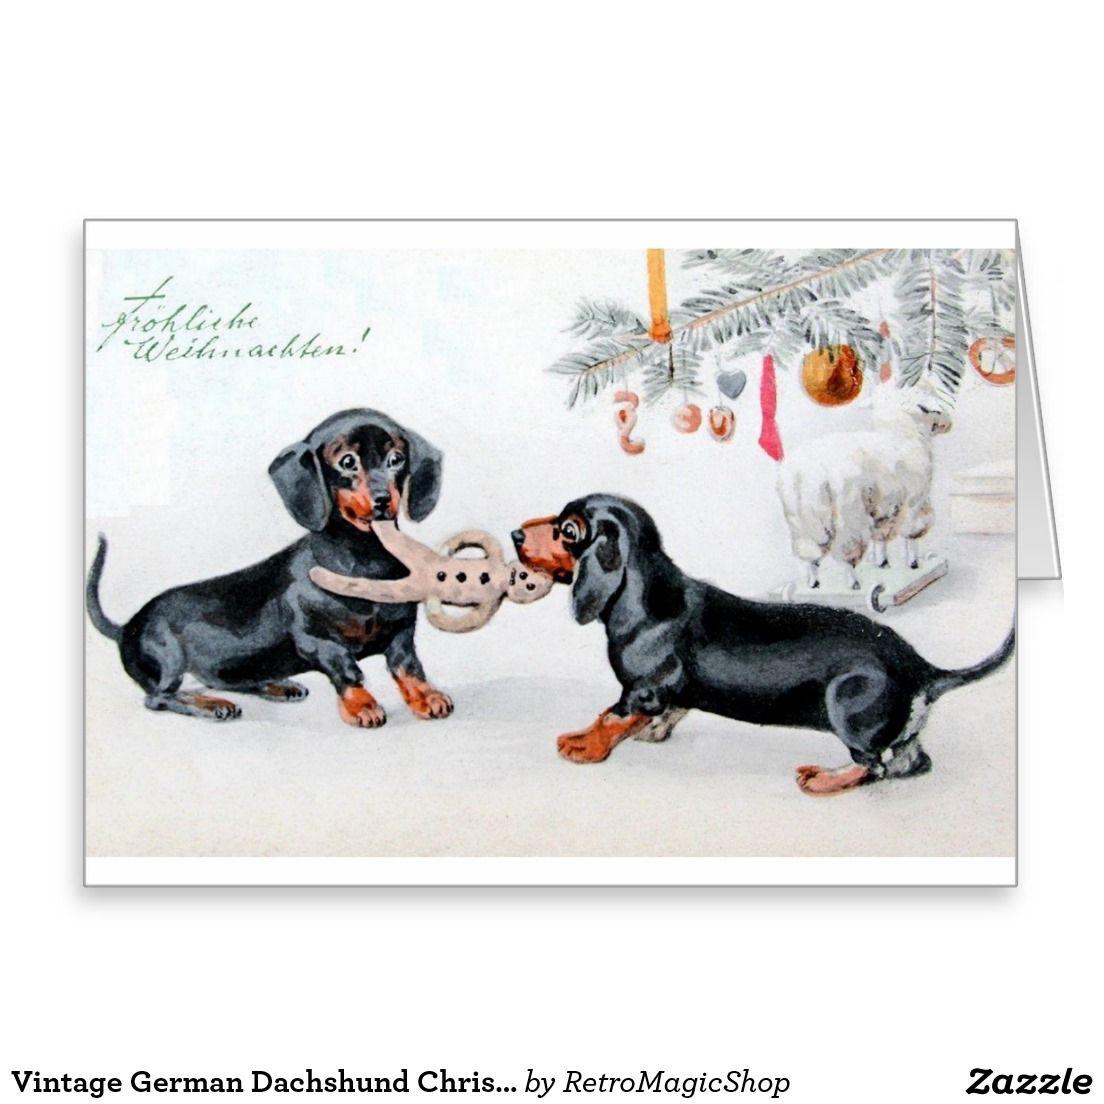 Vintage German Dachshund Christmas Card Zazzle Com Vintage